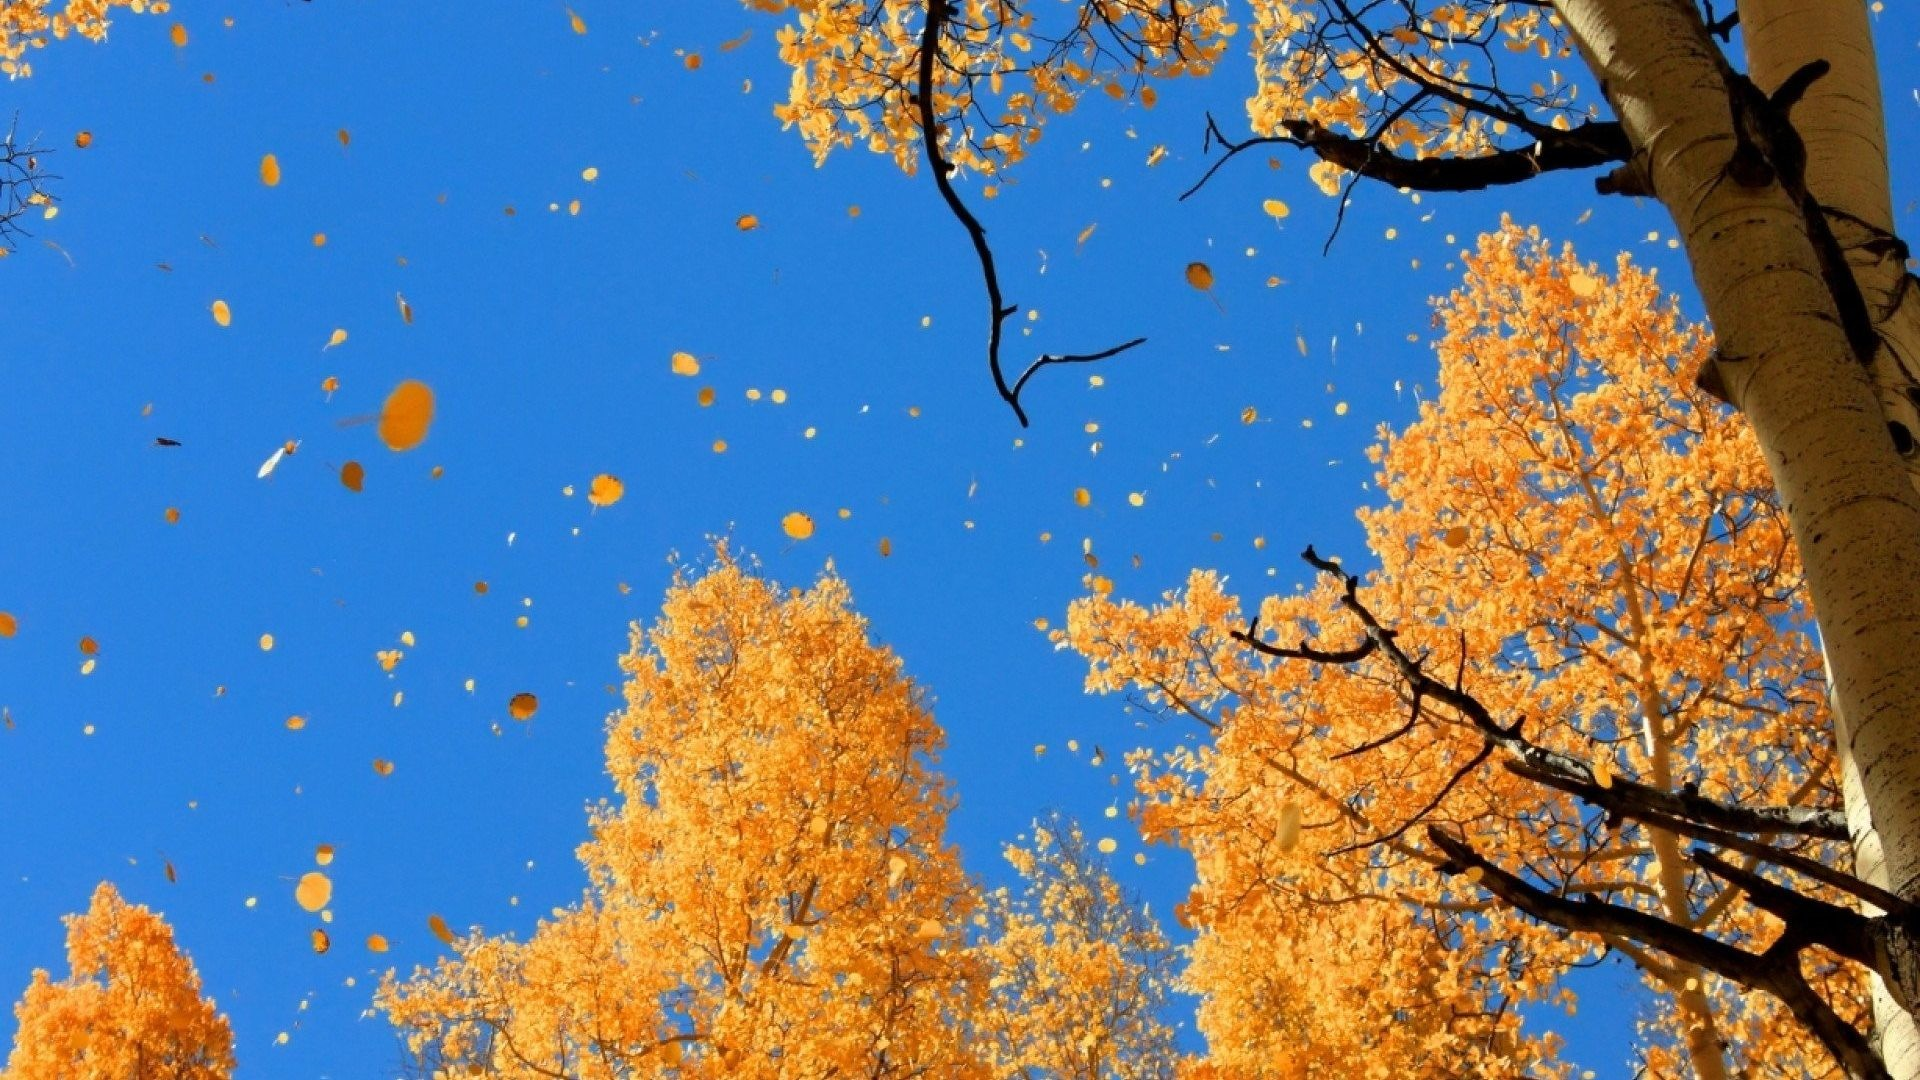 Landscape Tag – Forest Nature Fall Leaves Autumn Tree Landscape Wallpaper  Of For Desktop for HD